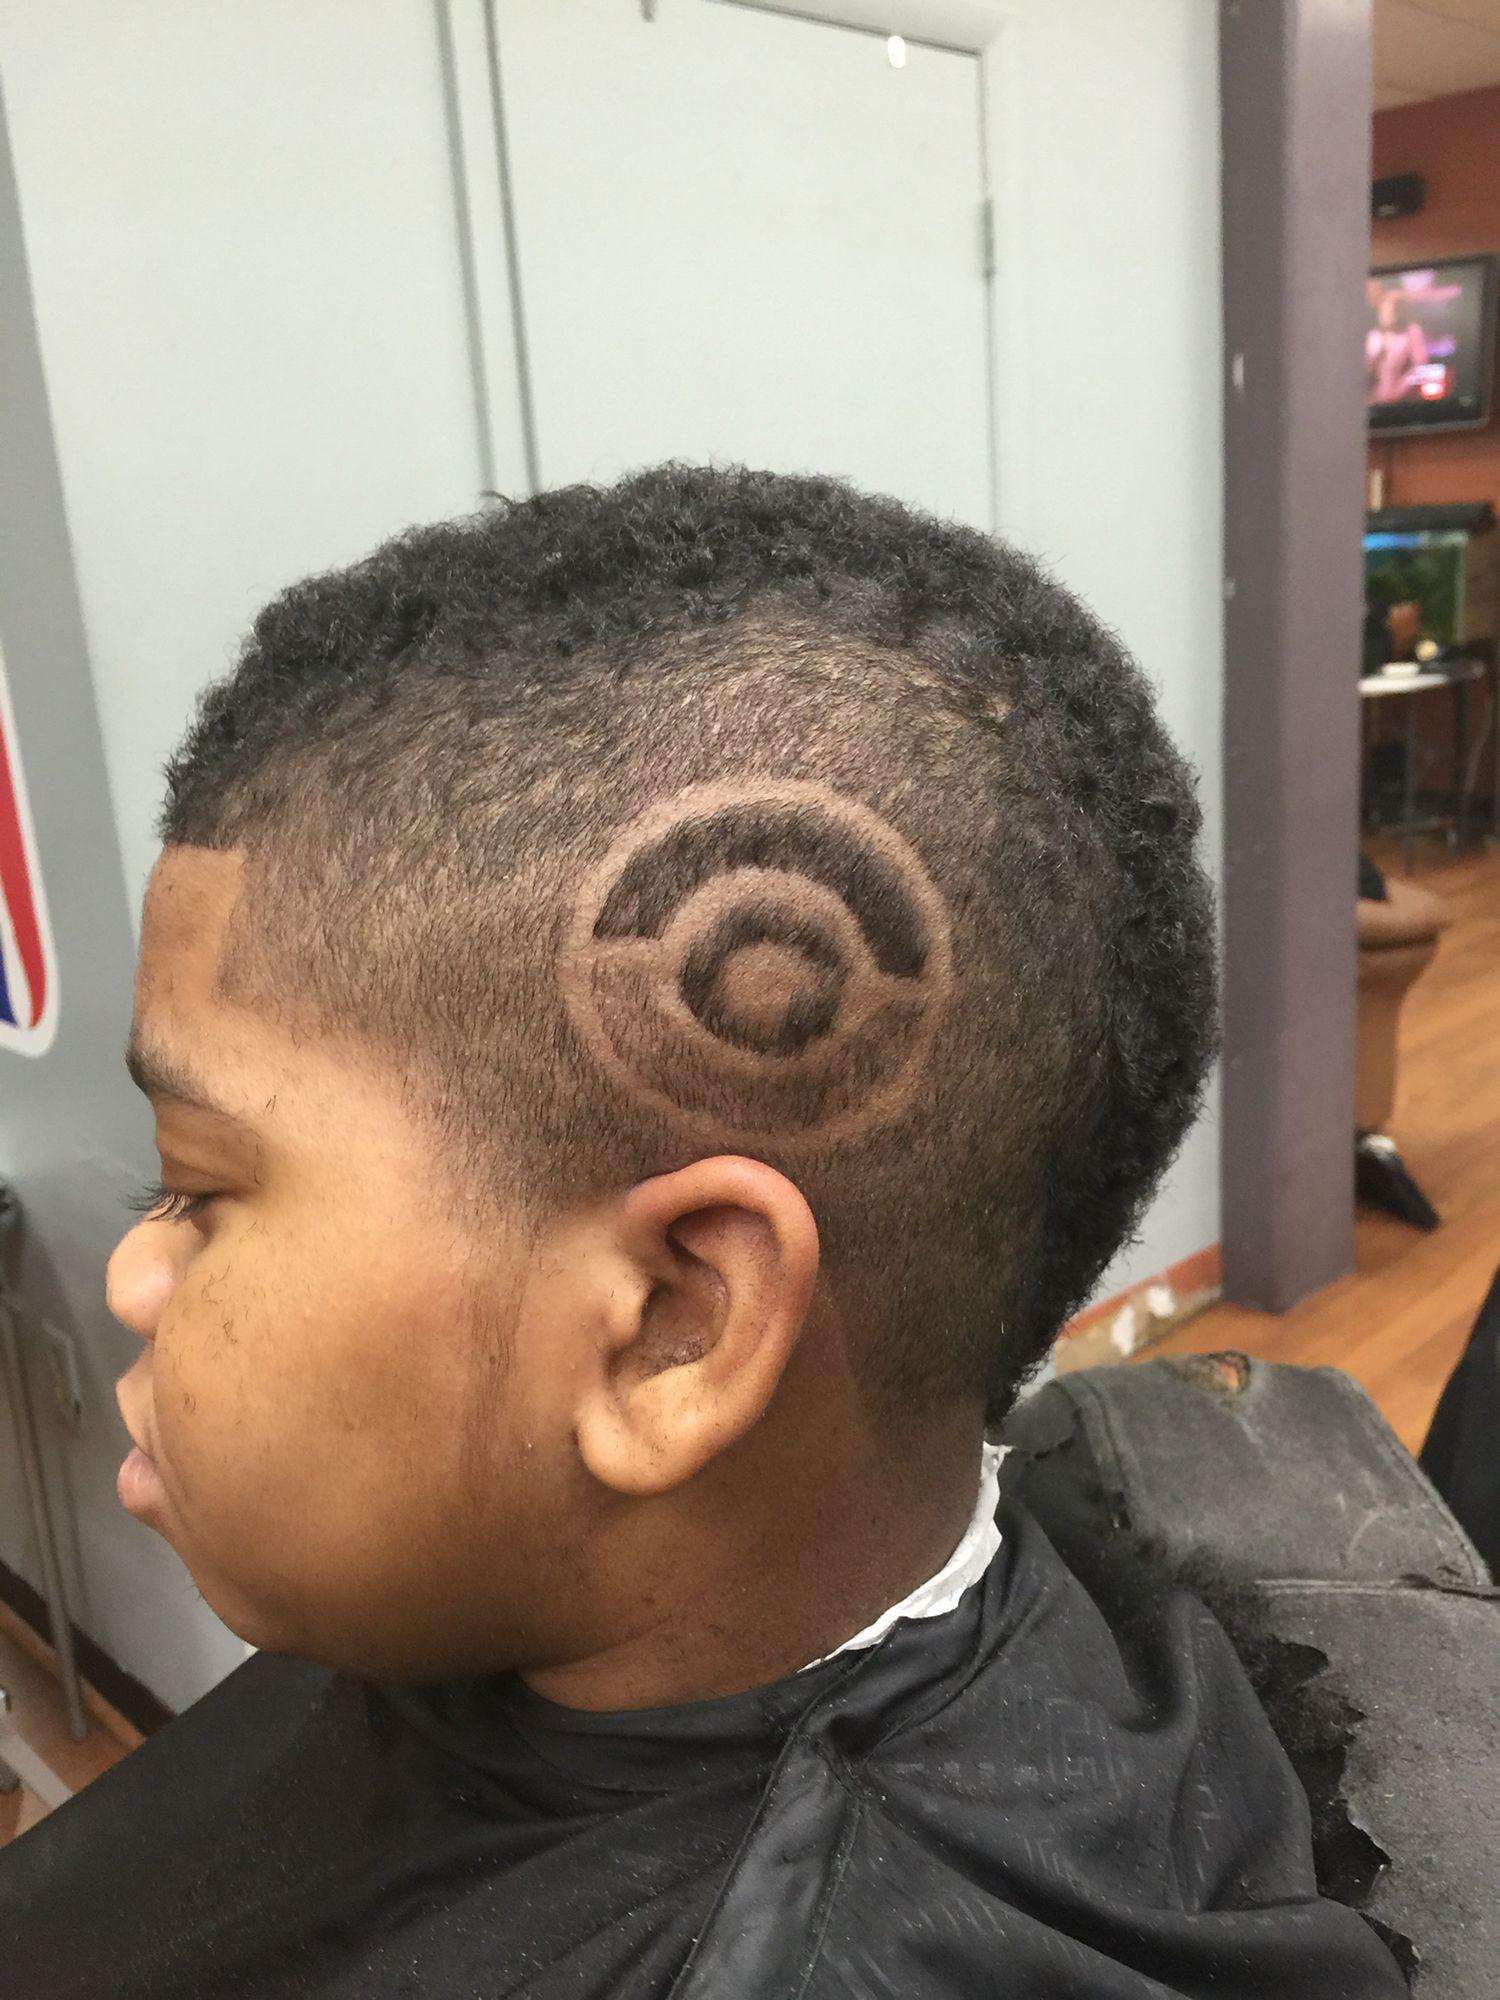 Pokemon Haircut : pokemon, haircut, Hairazors